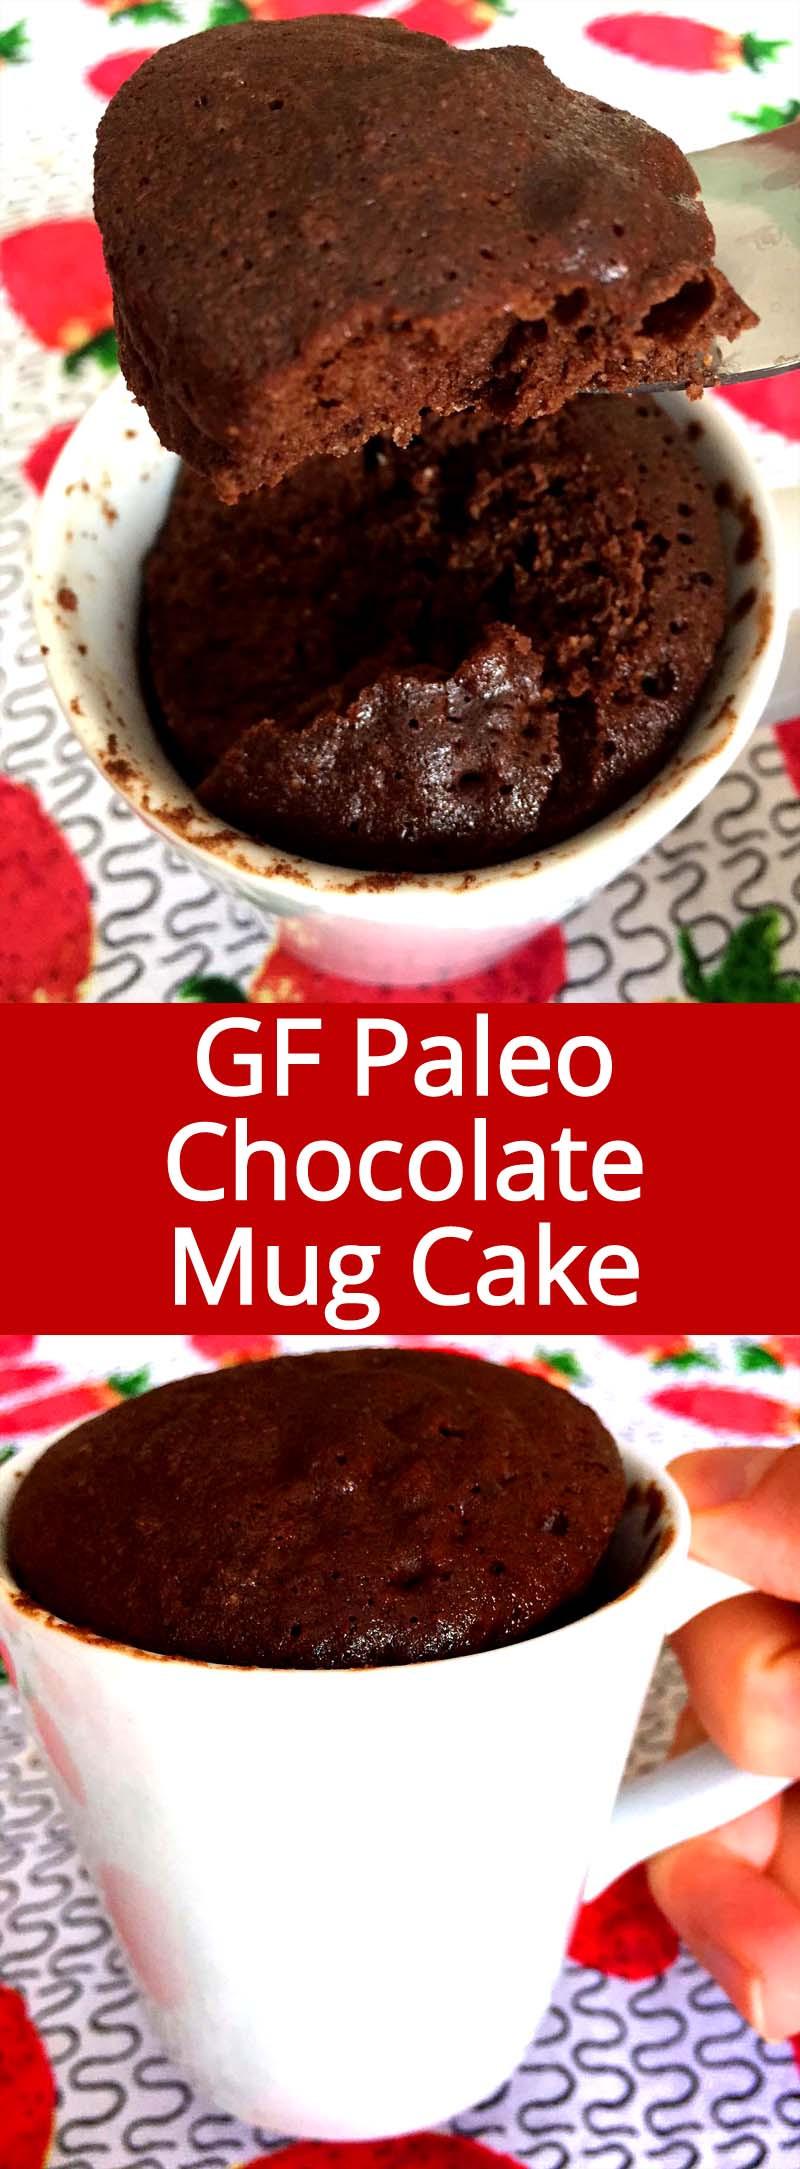 Healthy Chocolate Mug Cake  Healthy Chocolate Mug Cake Recipe Gluten Free Paleo